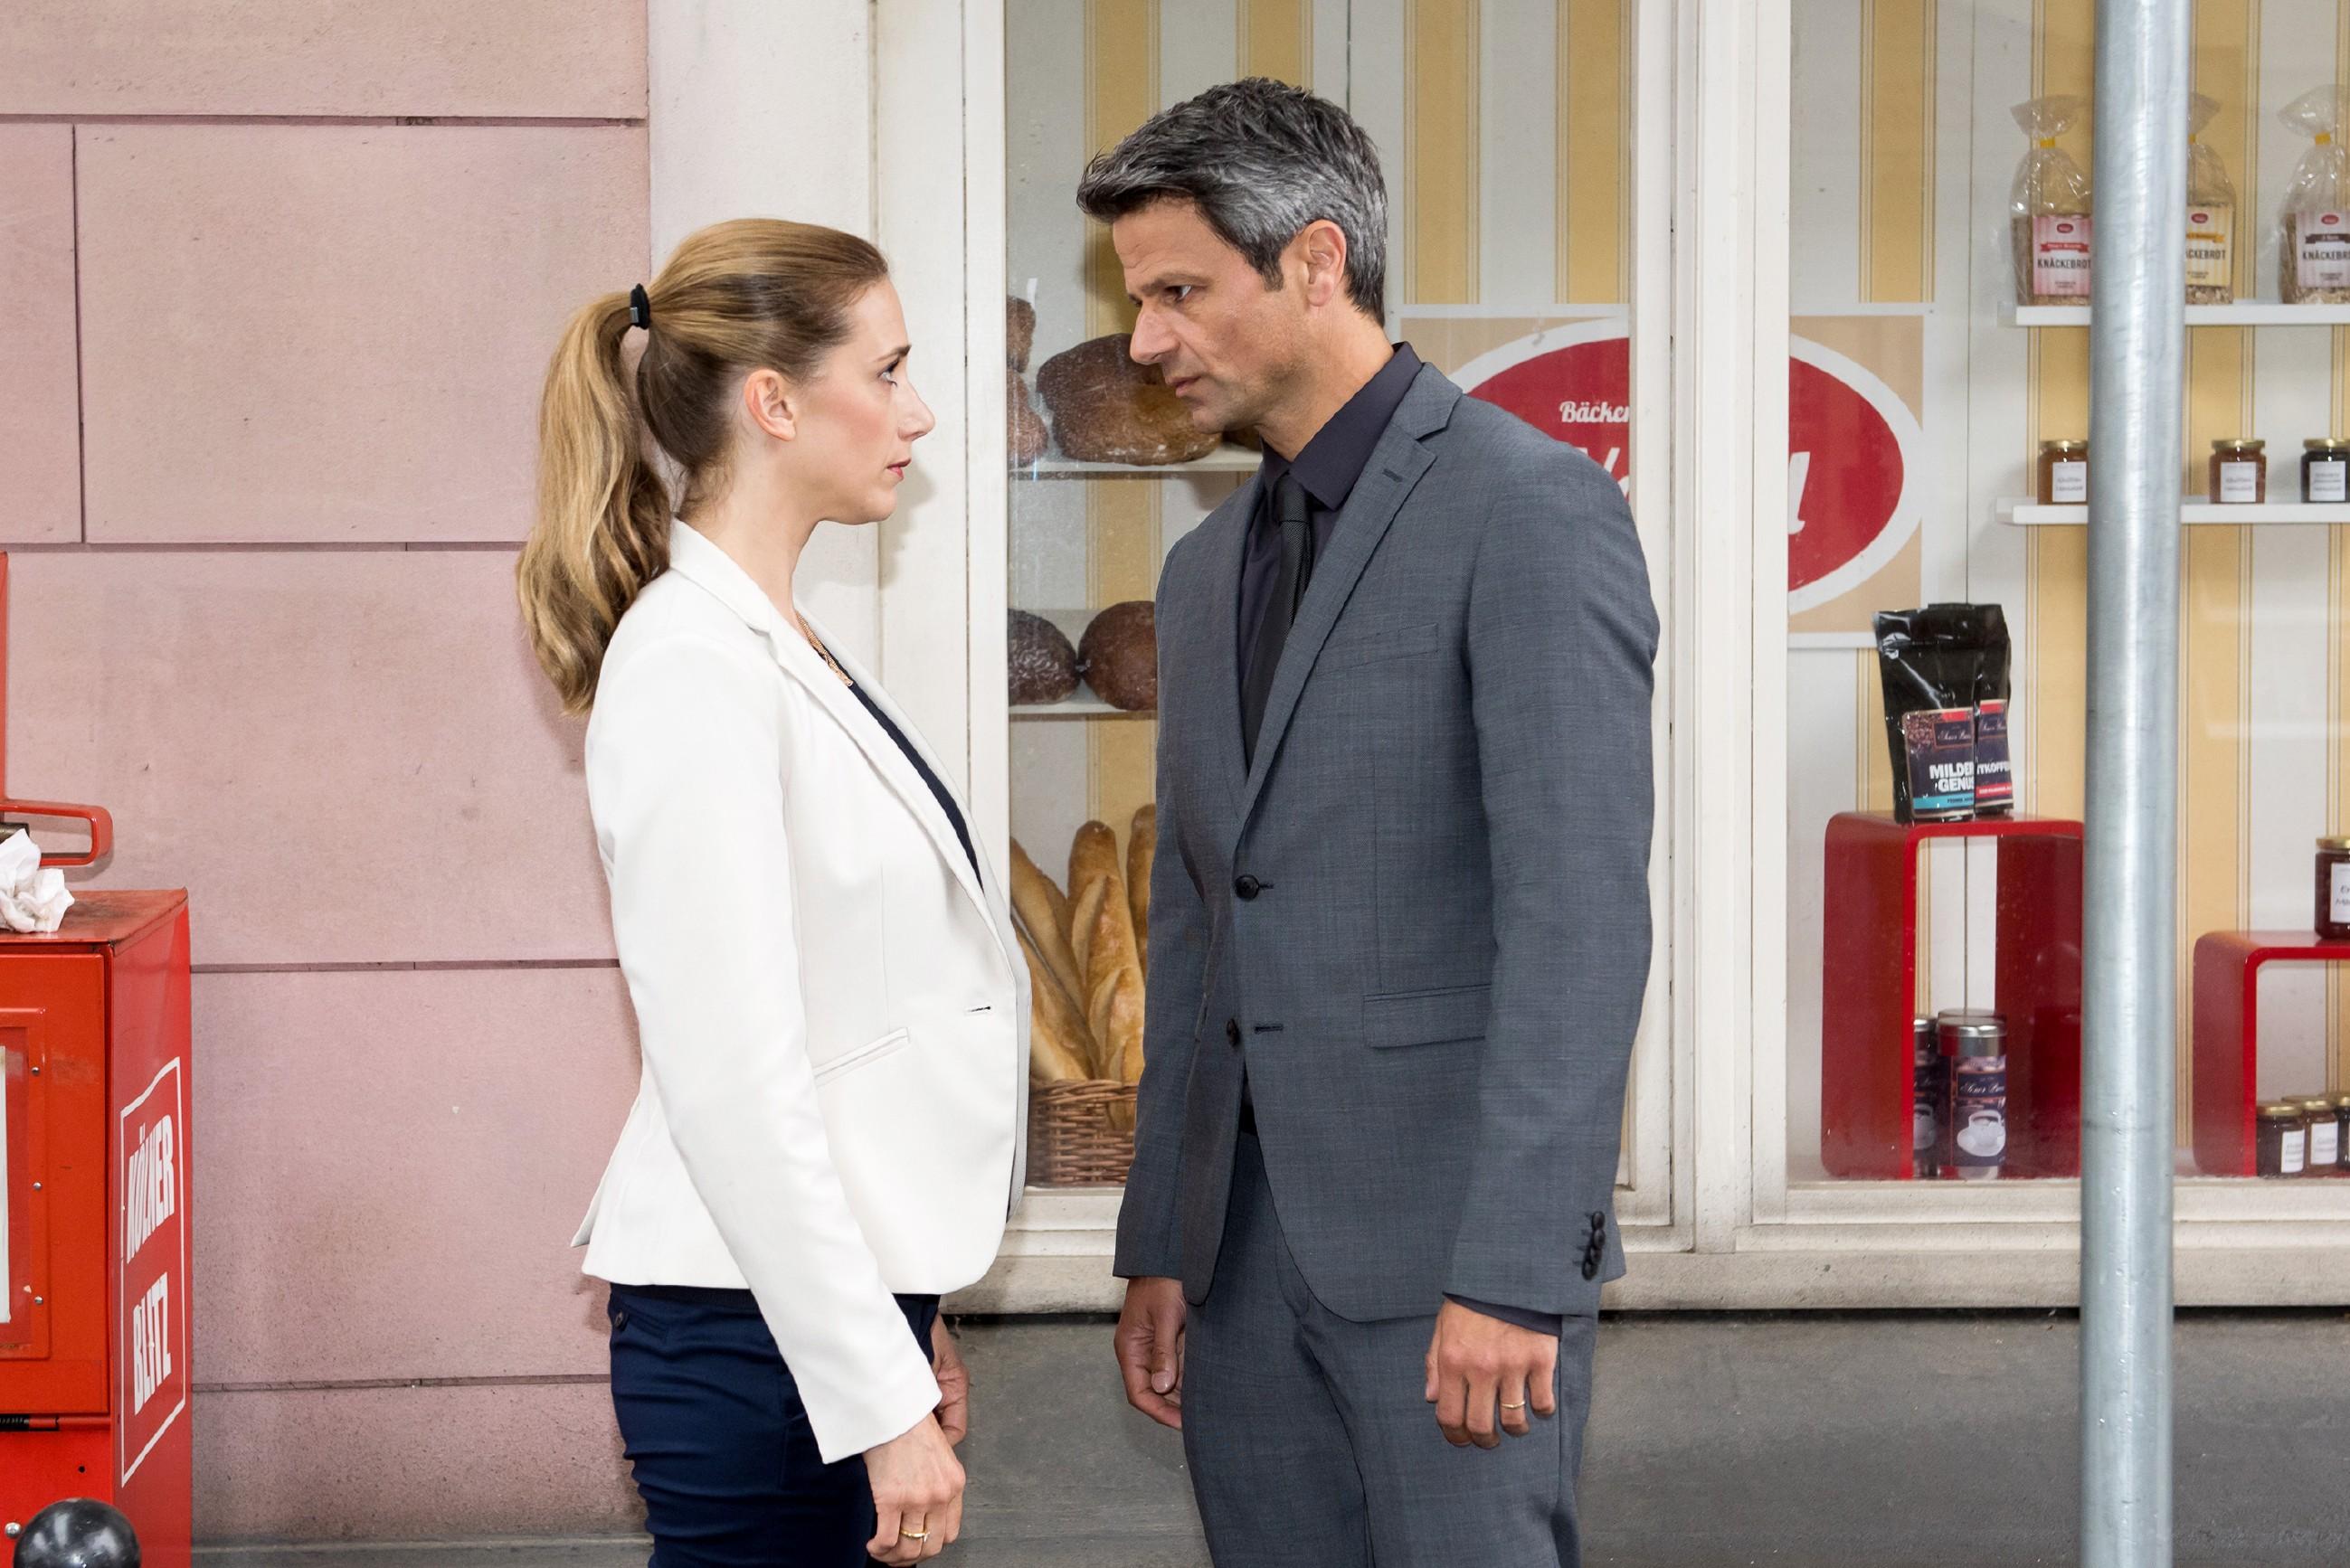 Benedikt (Jens Hajek) weist Andrea (Kristin Meyer) scharf in ihre Schranken. (Foto: RTL / Stefan Behrens)